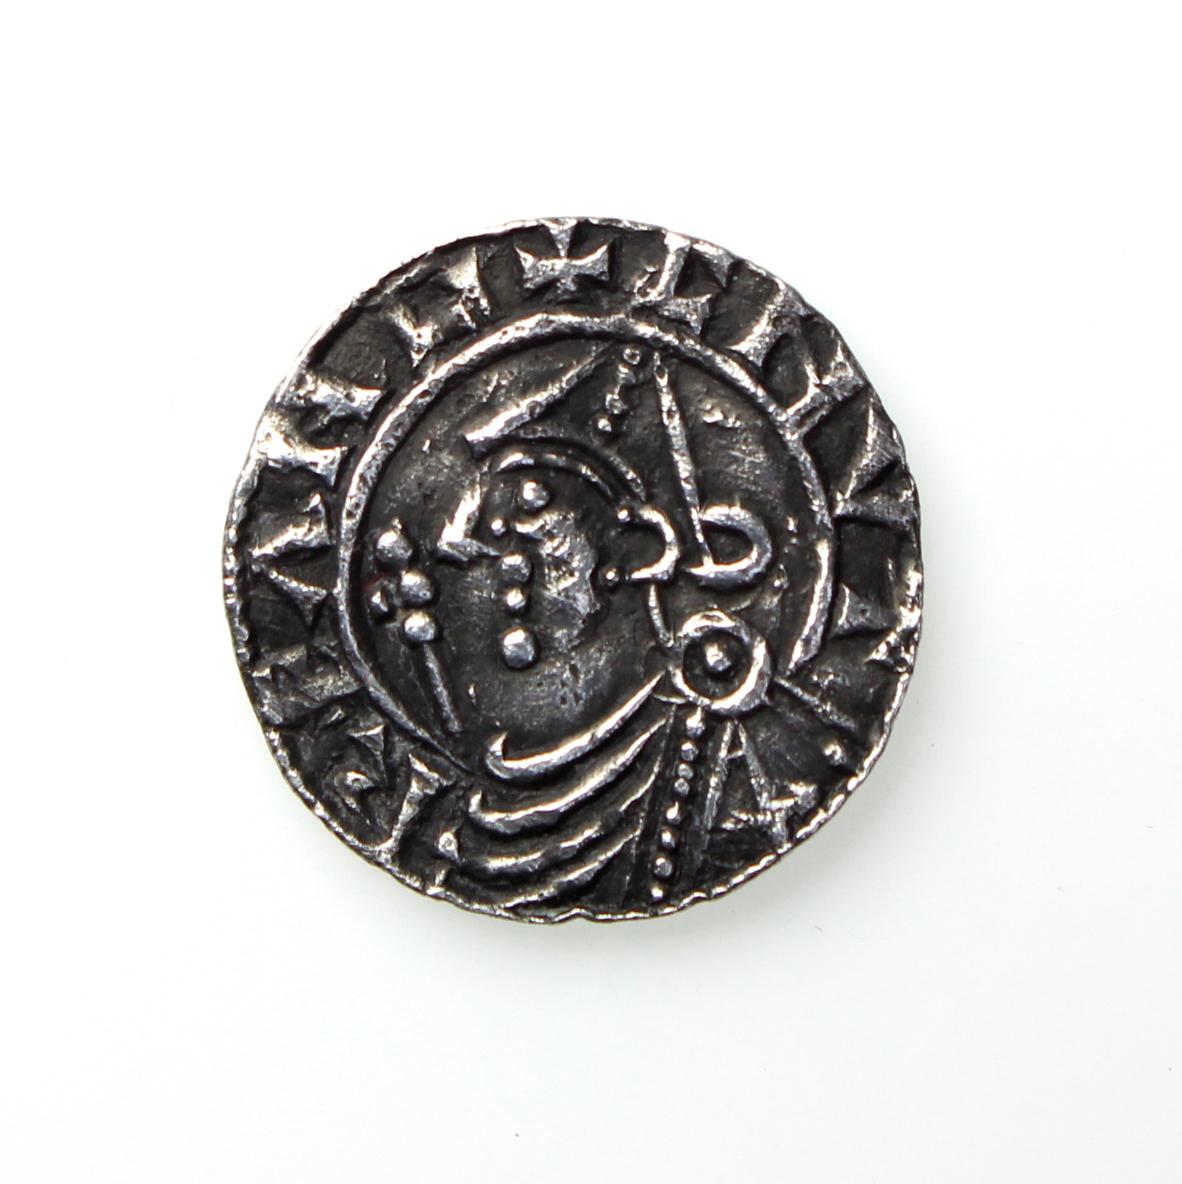 leicester coin company